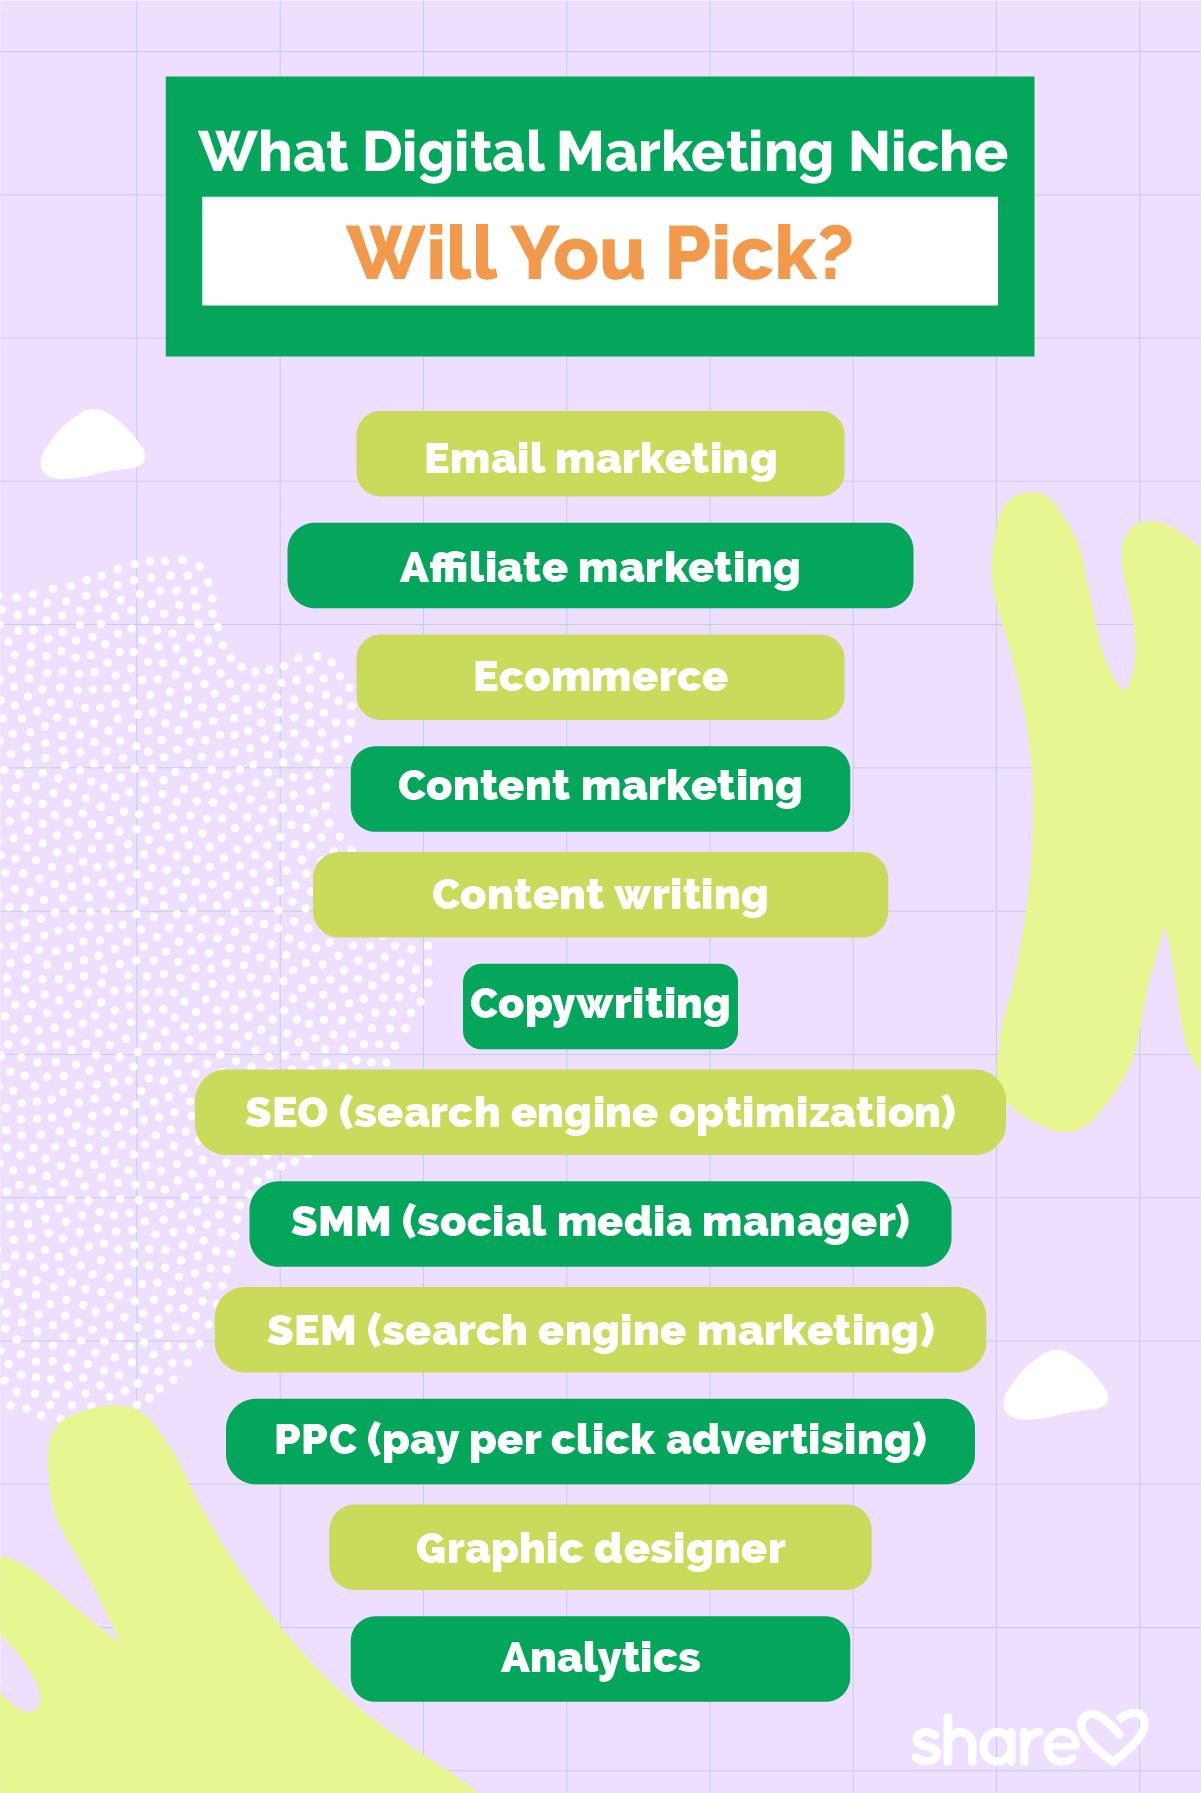 What Digital Marketing Niche Will You Pick?